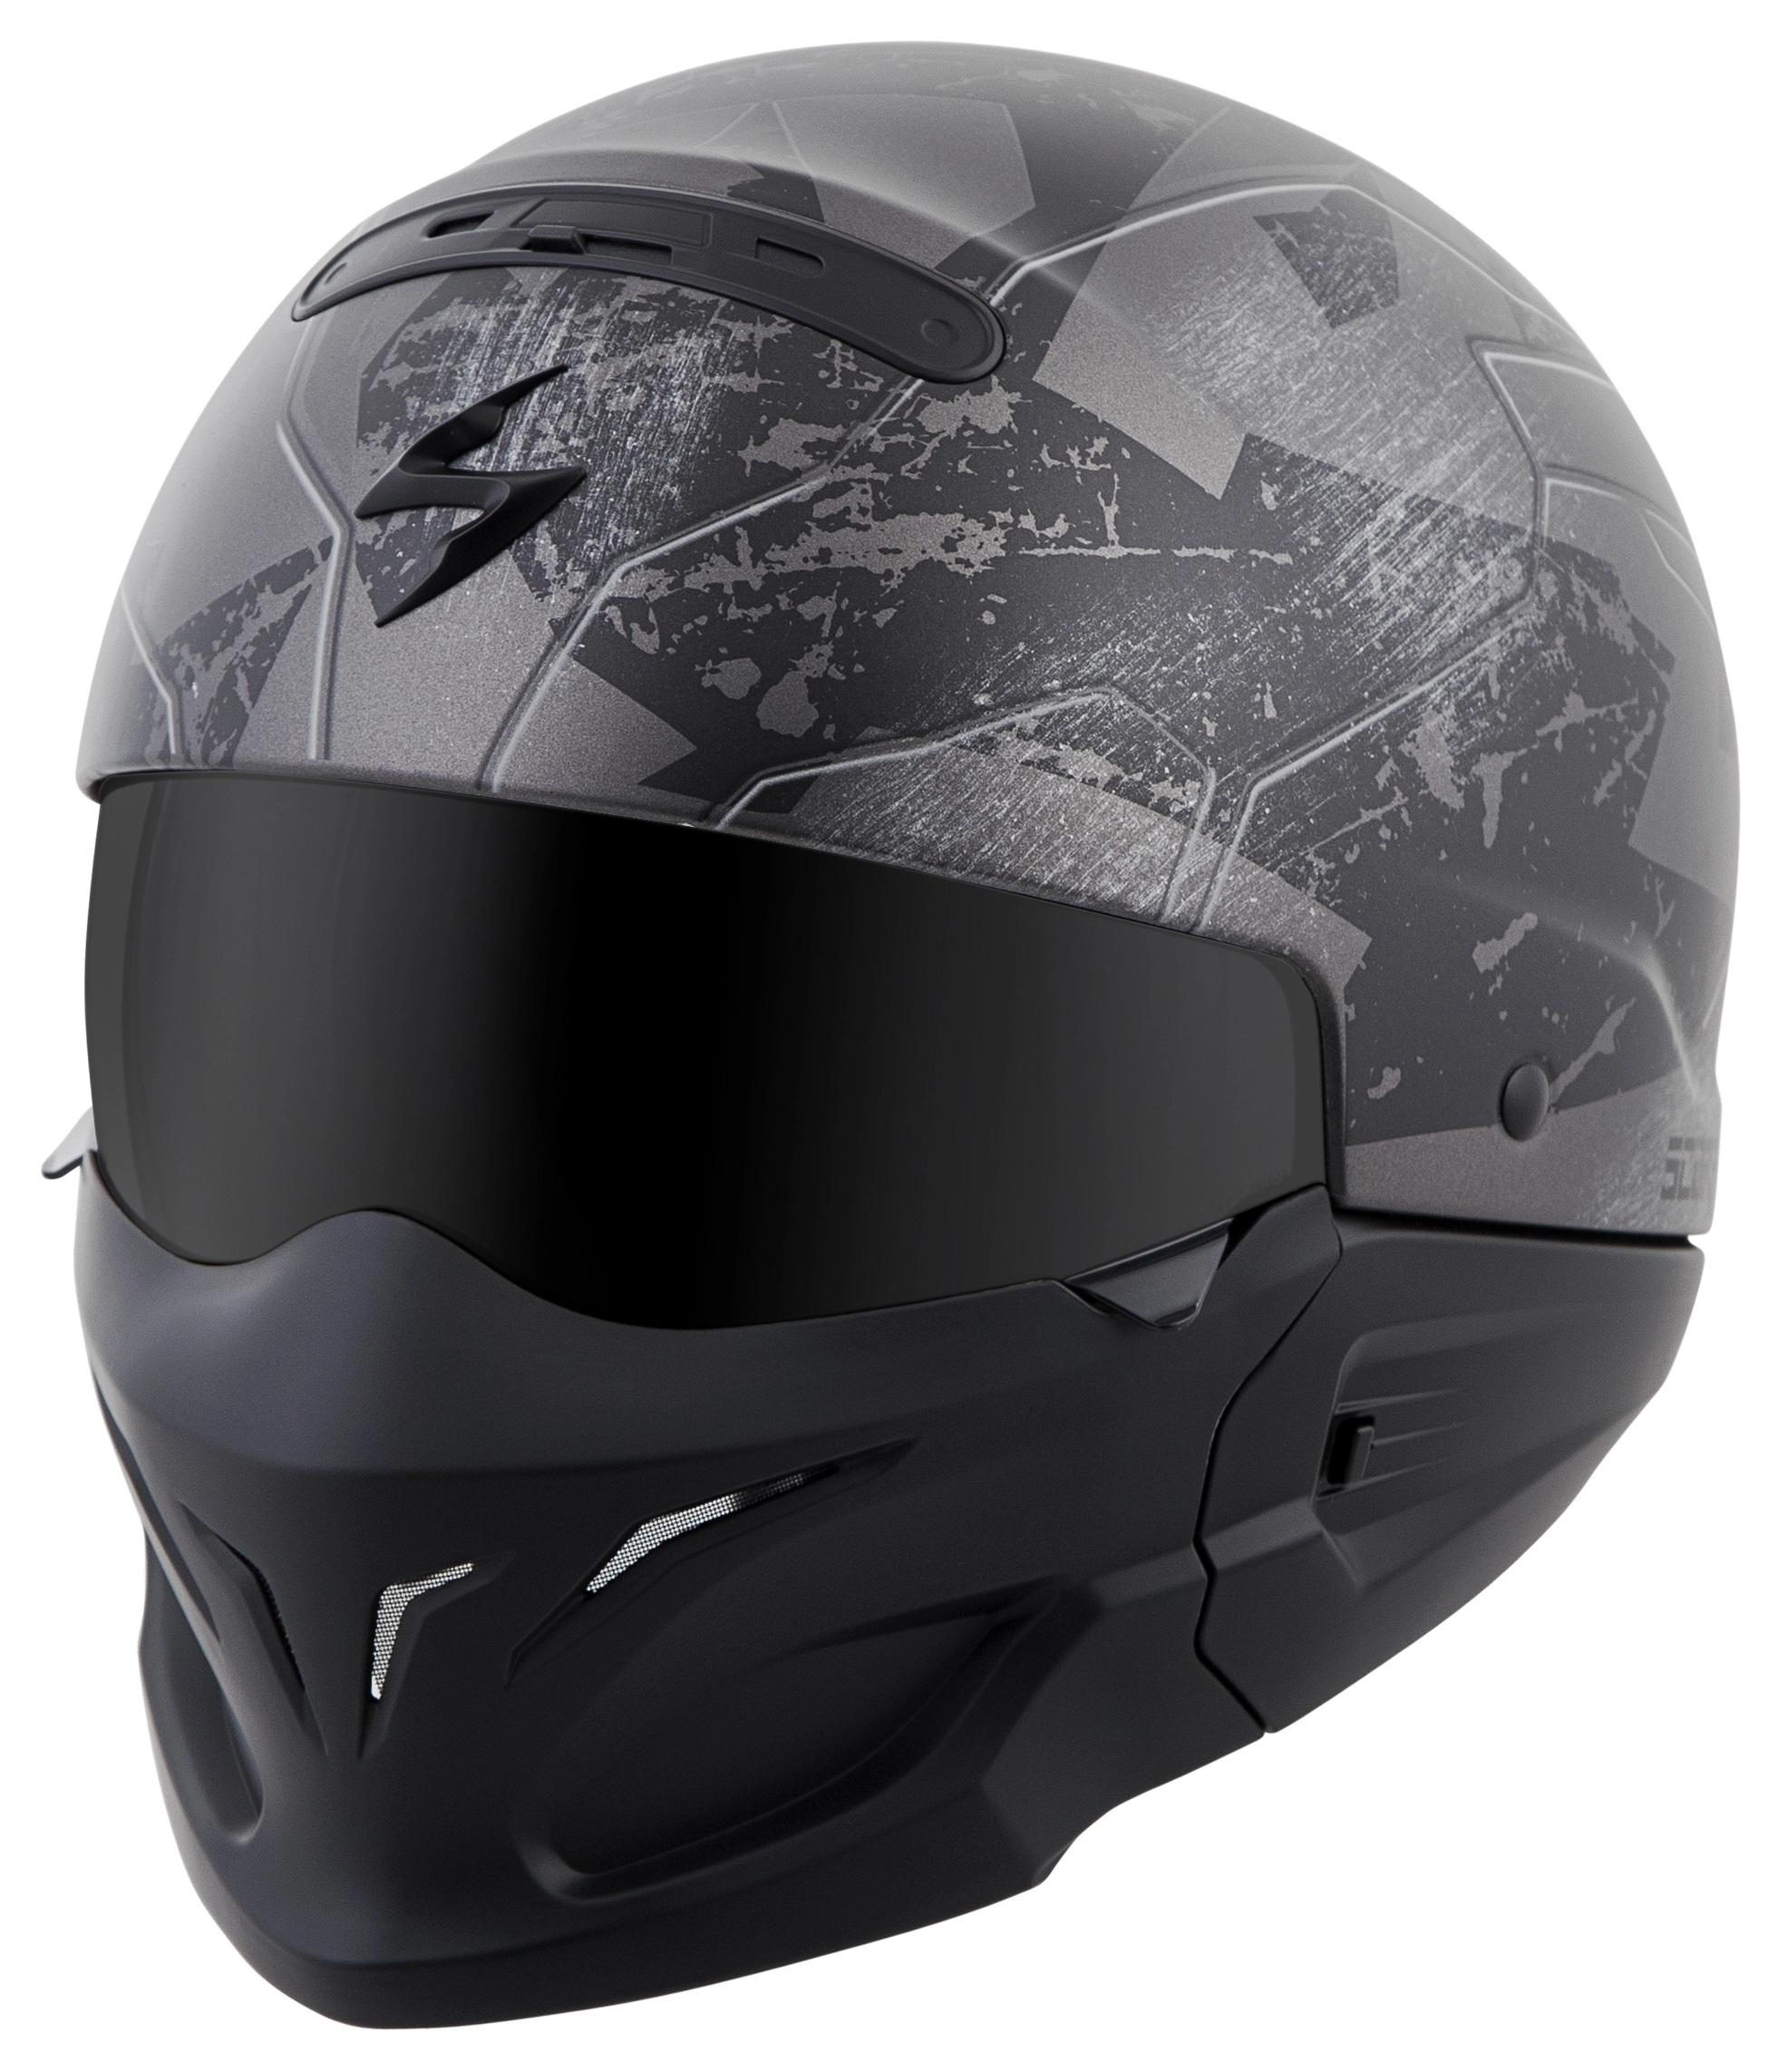 Scorpion EXO Covert Ratnik Helmet